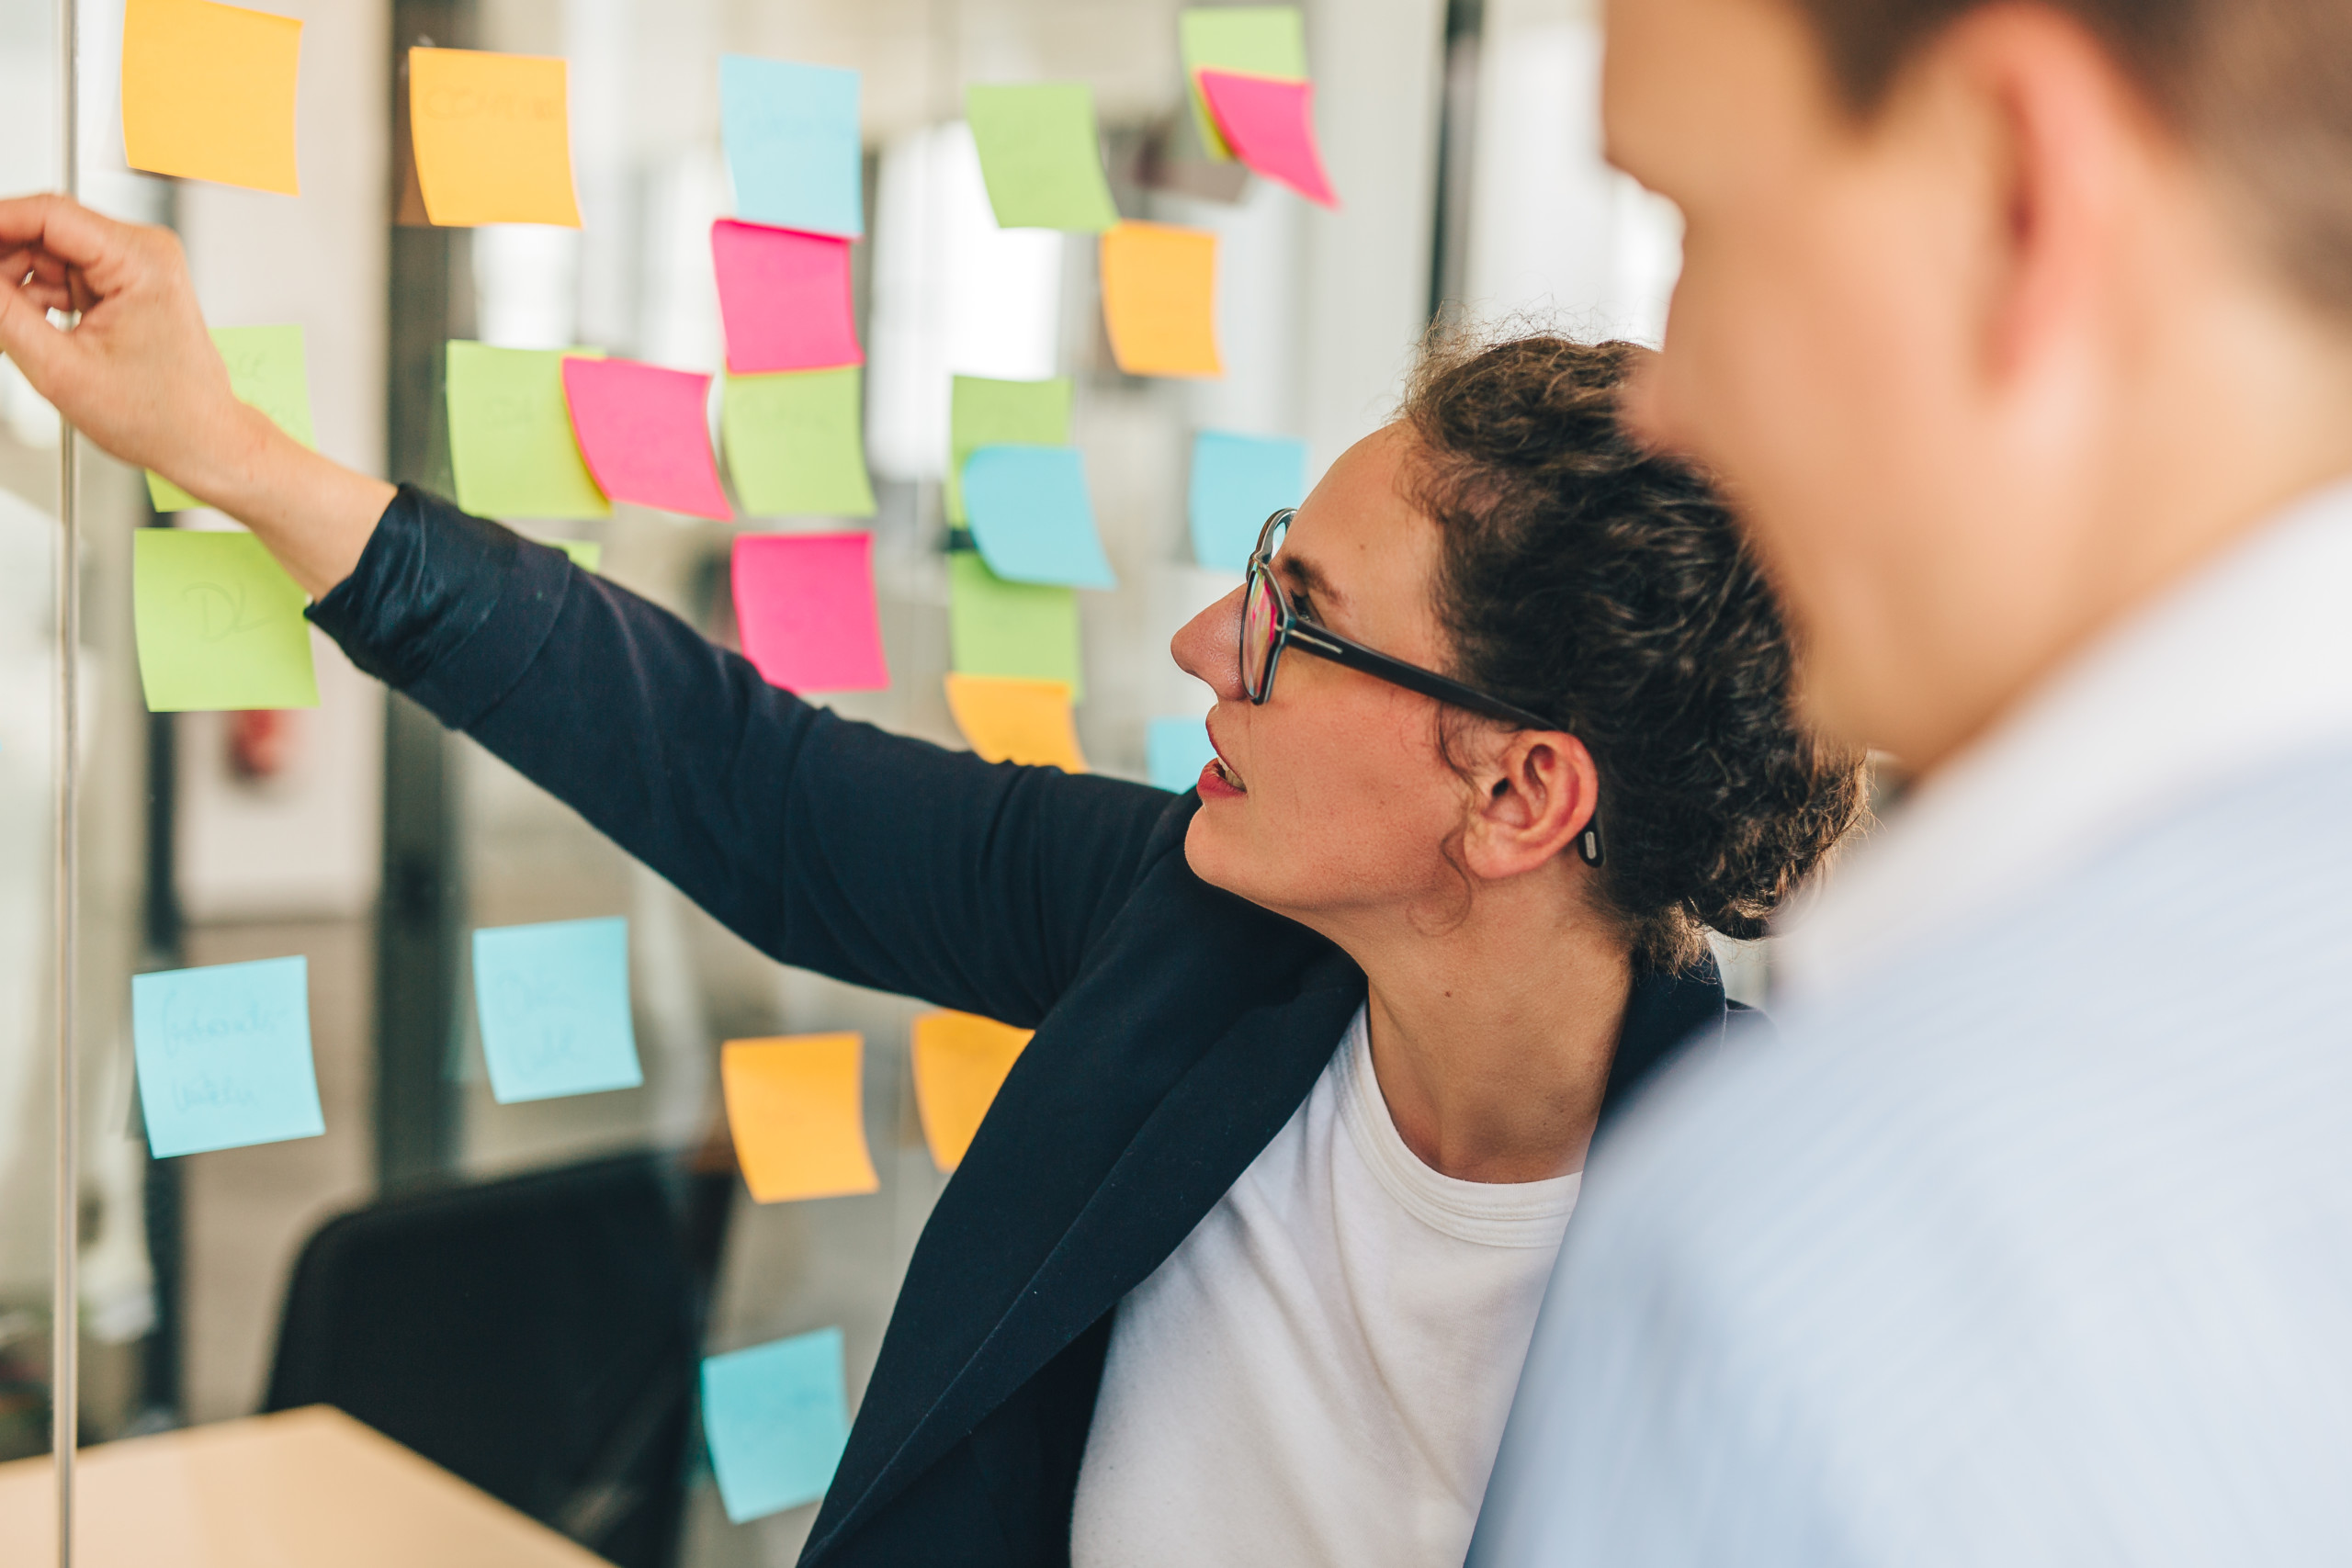 Agiles Arbeiten im Team mit Post it Notes